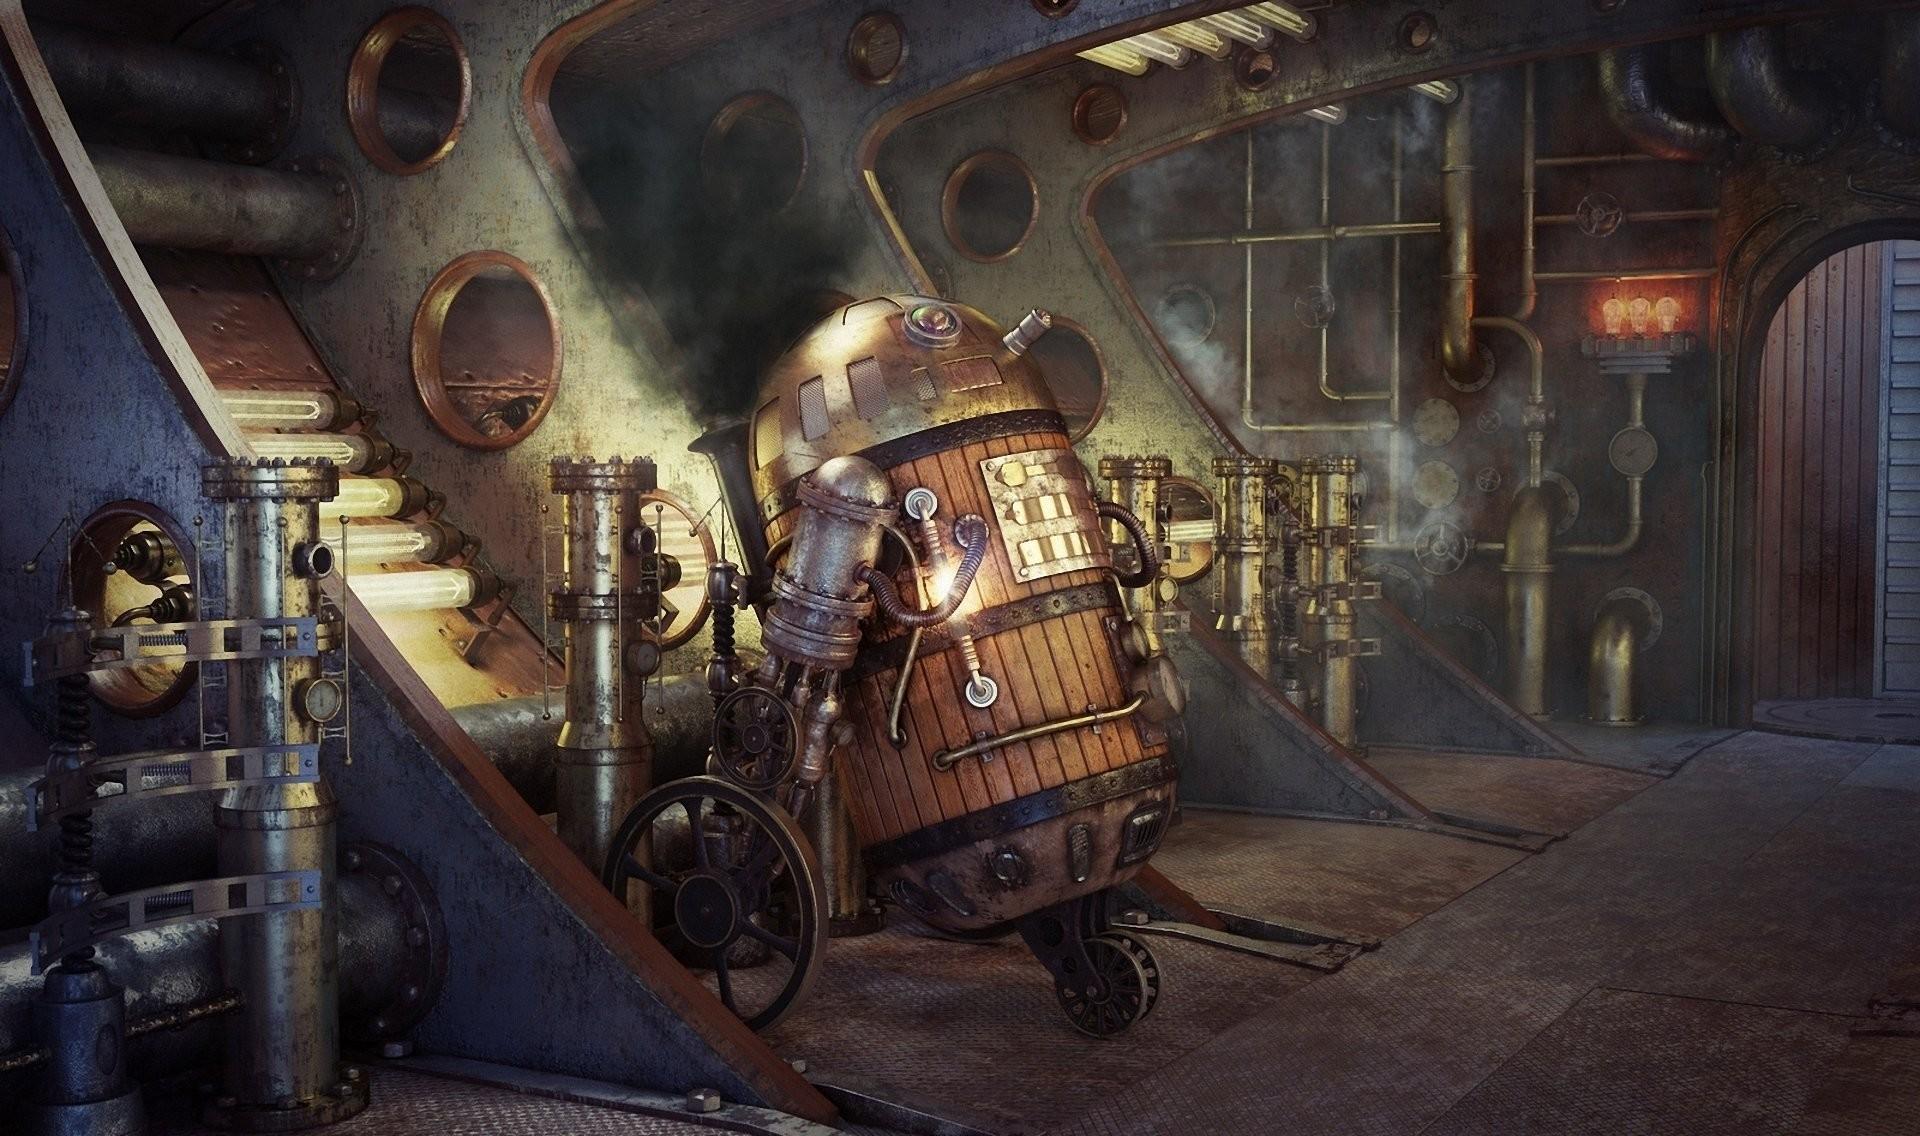 art star wars steampunk robots r2d2 smoke of the tube